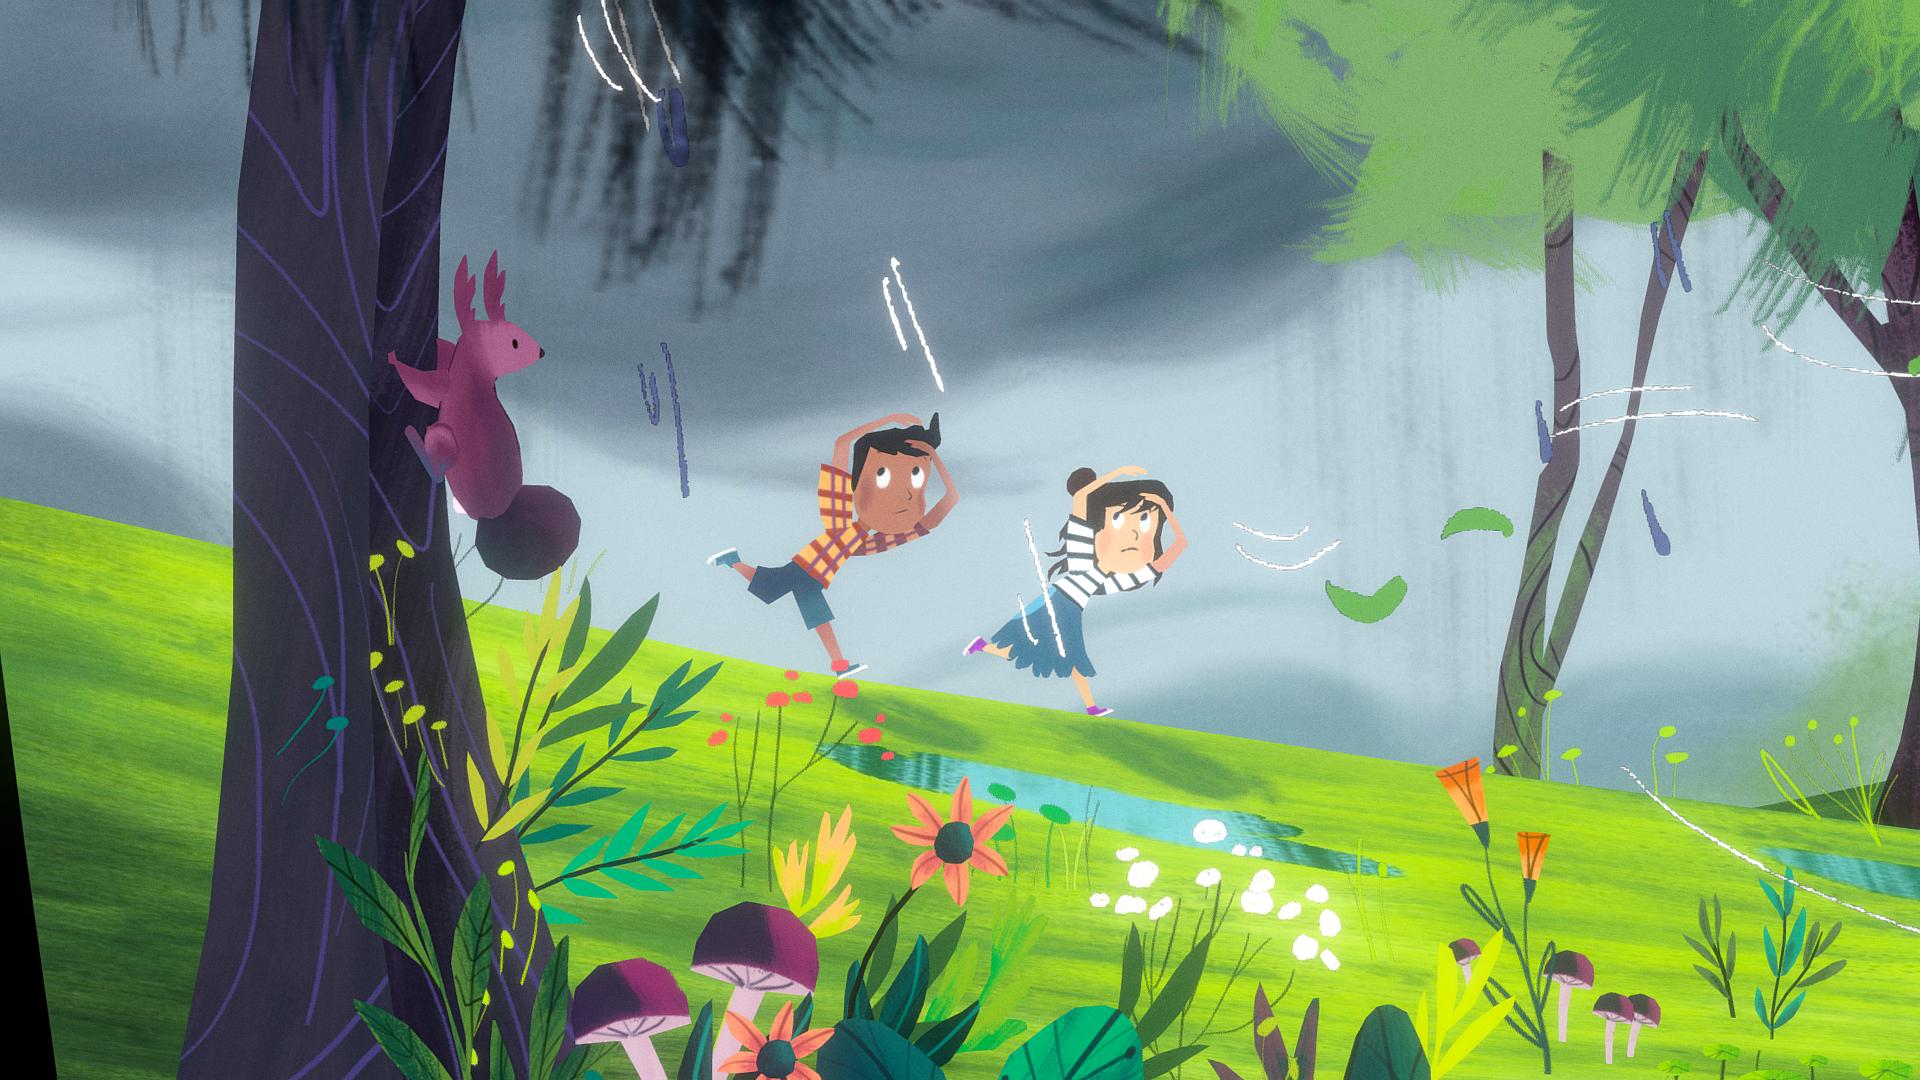 Storybook Scene Hand-painting Challenge